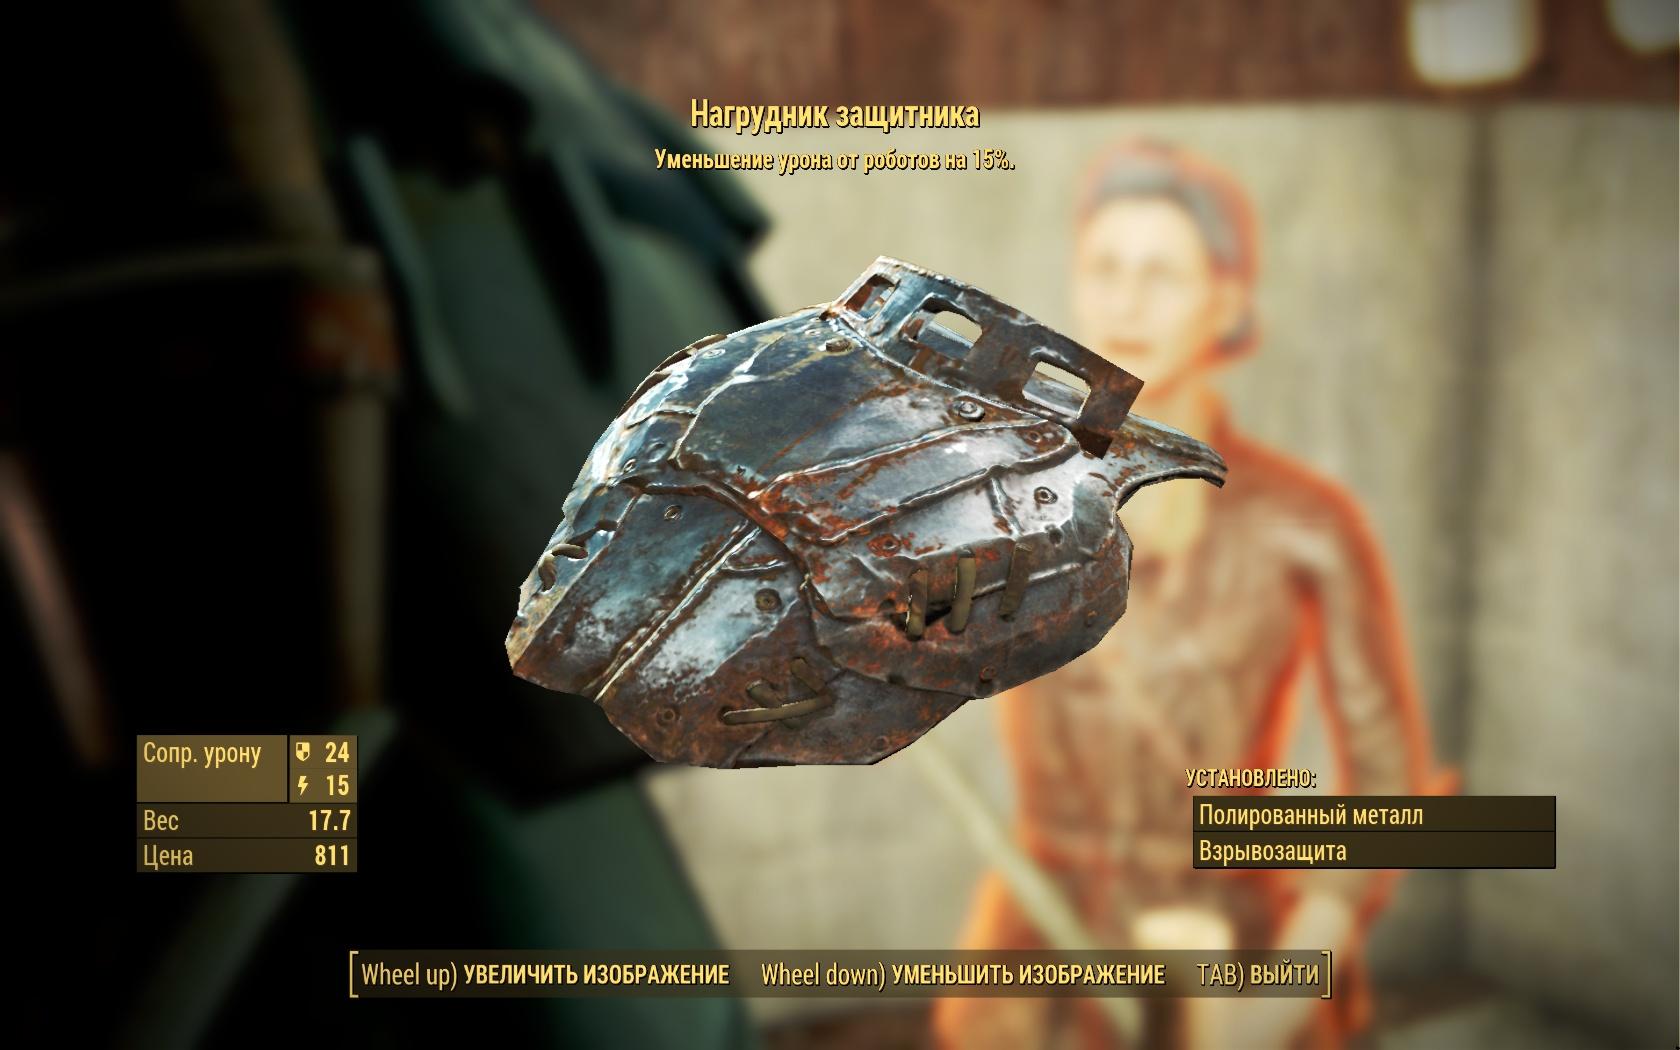 Нагрудник защитника - Fallout 4 защитник, Нагрудник, Одежда